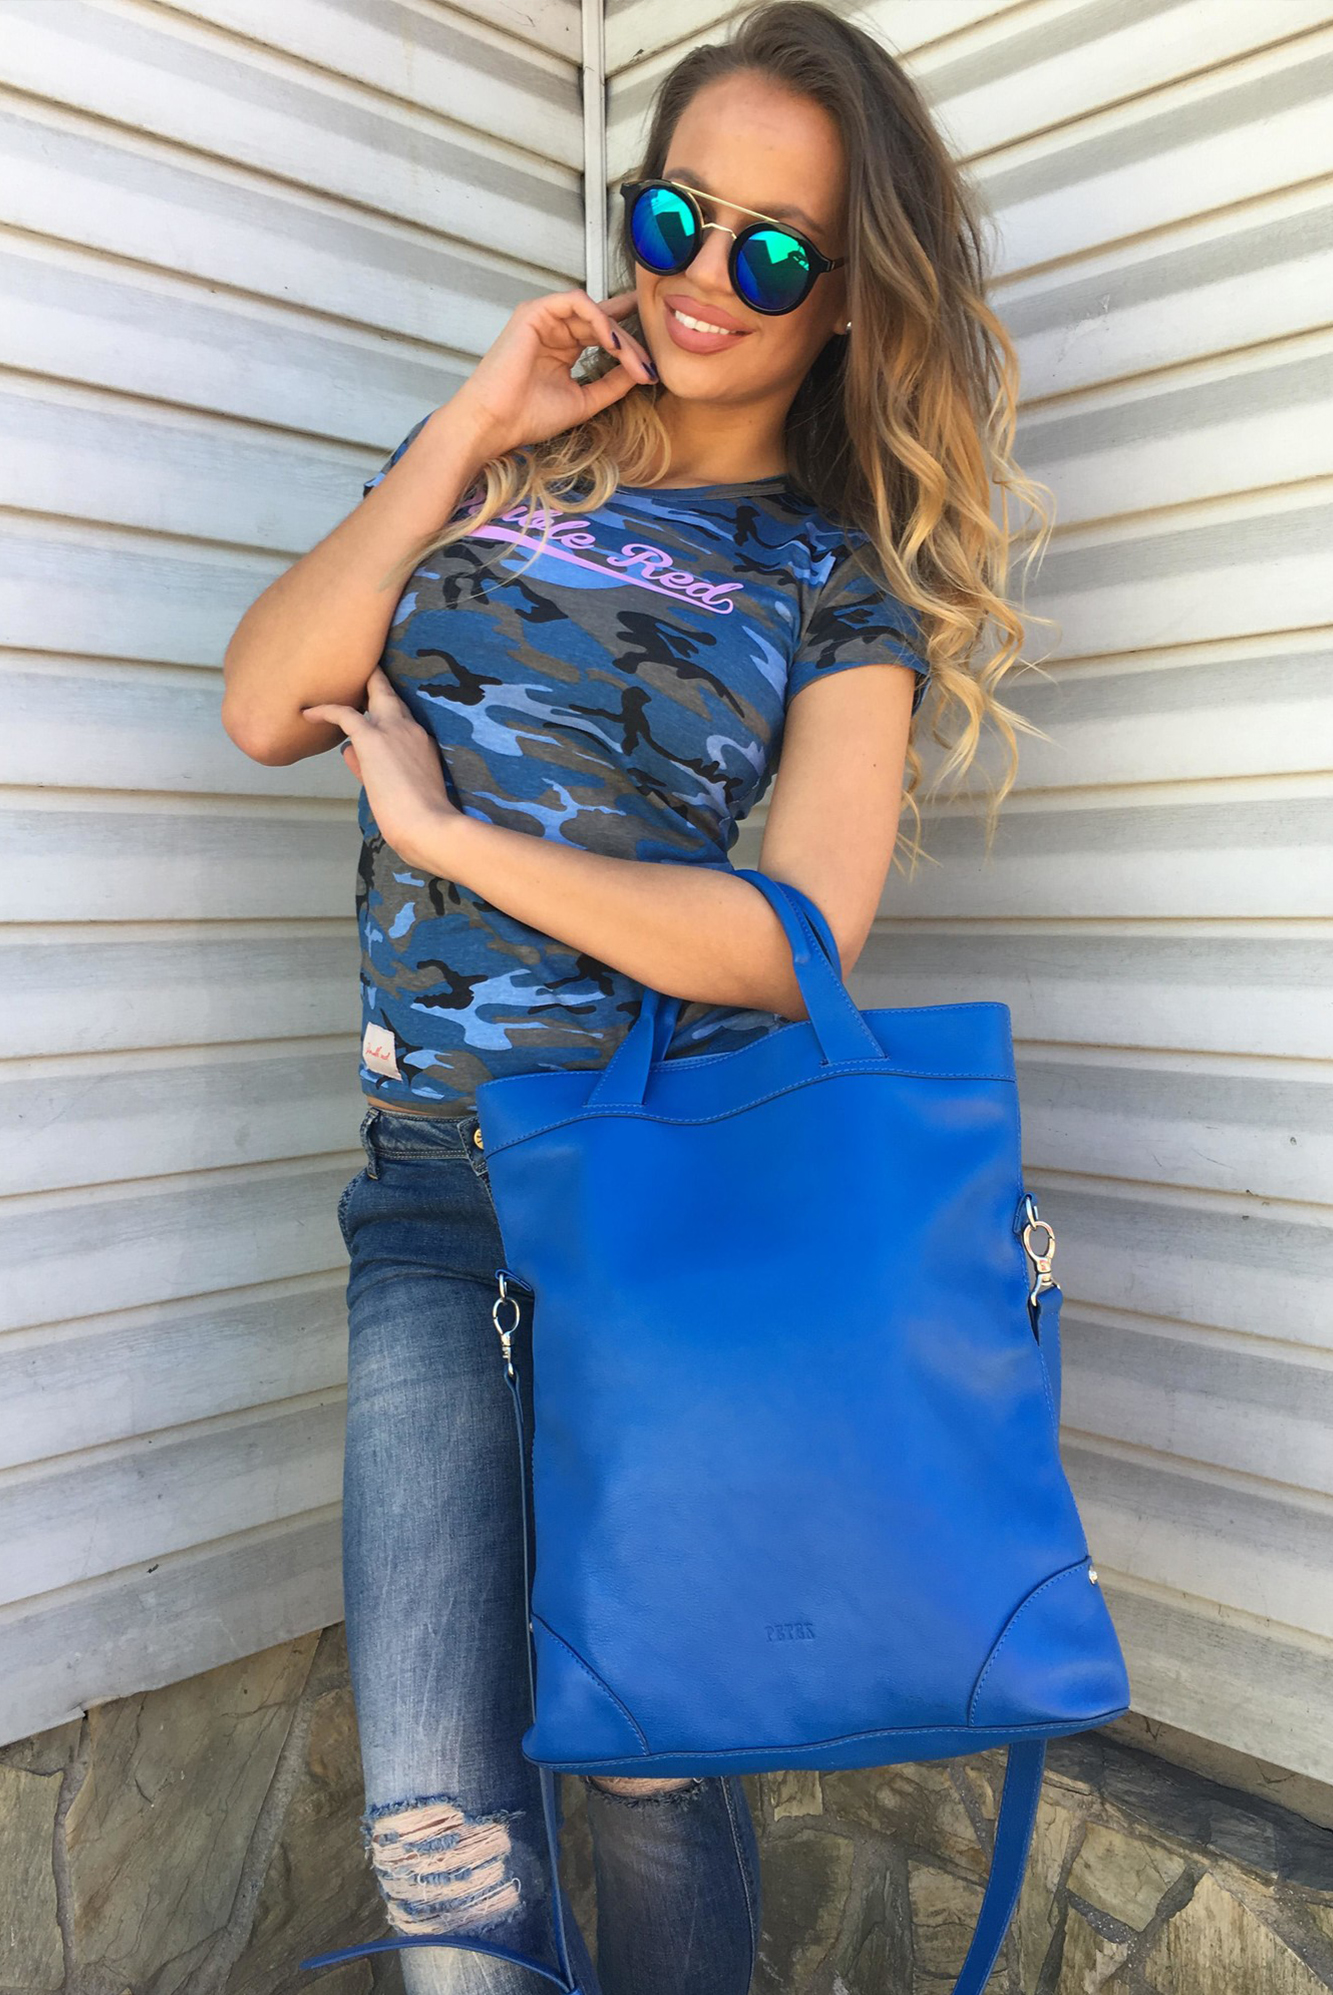 Dámska kožená královská modrá kabelka s ramienkom cez plece - UNI